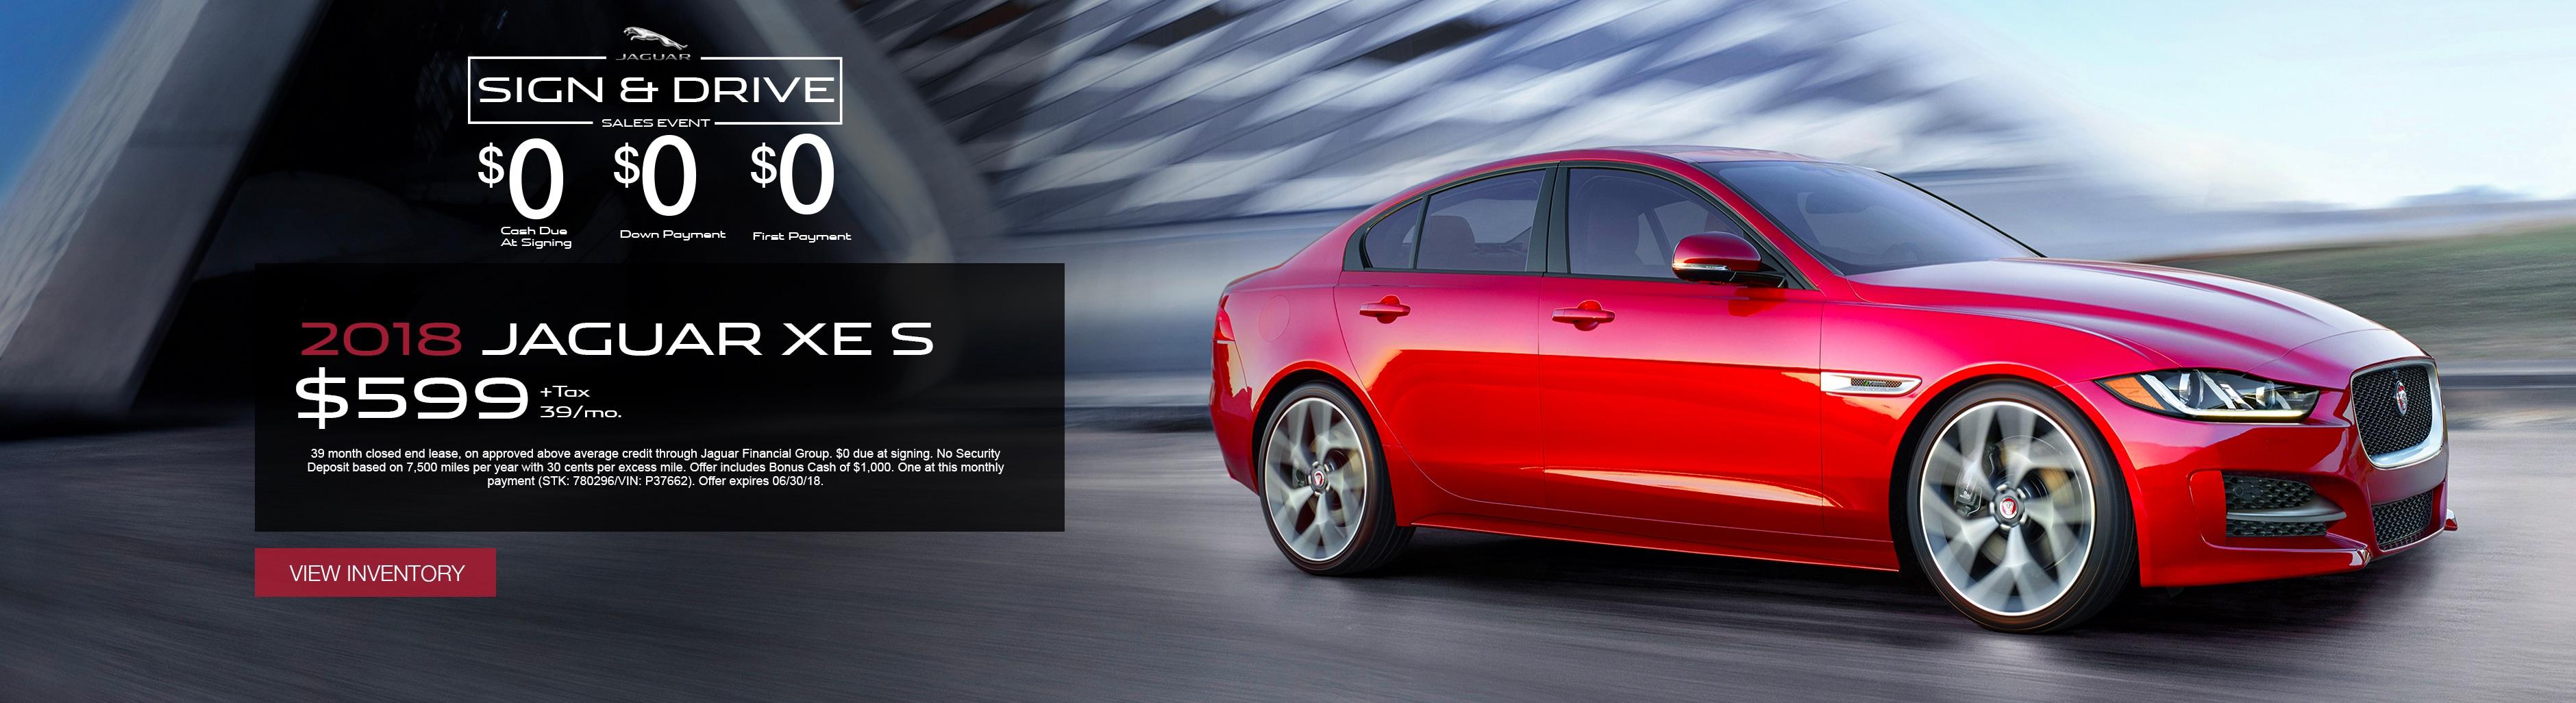 jaguar prepares kacher rear angeles f all inline six seat new e pace los electric dealership news engines georg